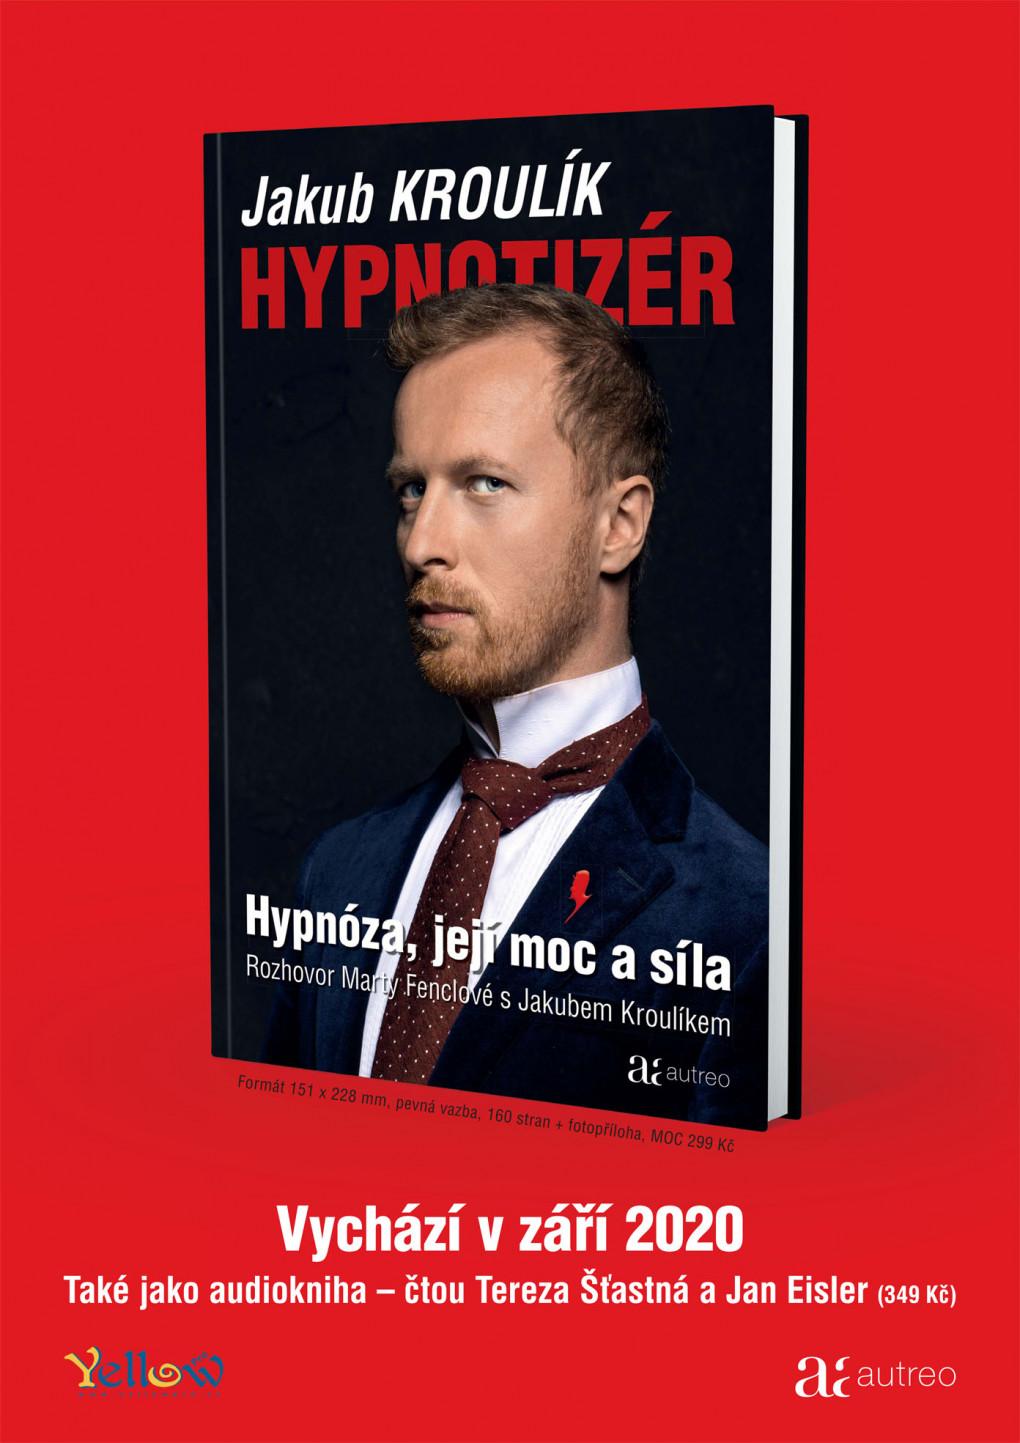 kroulik_jakub_kniha_plakat_2020.jpg